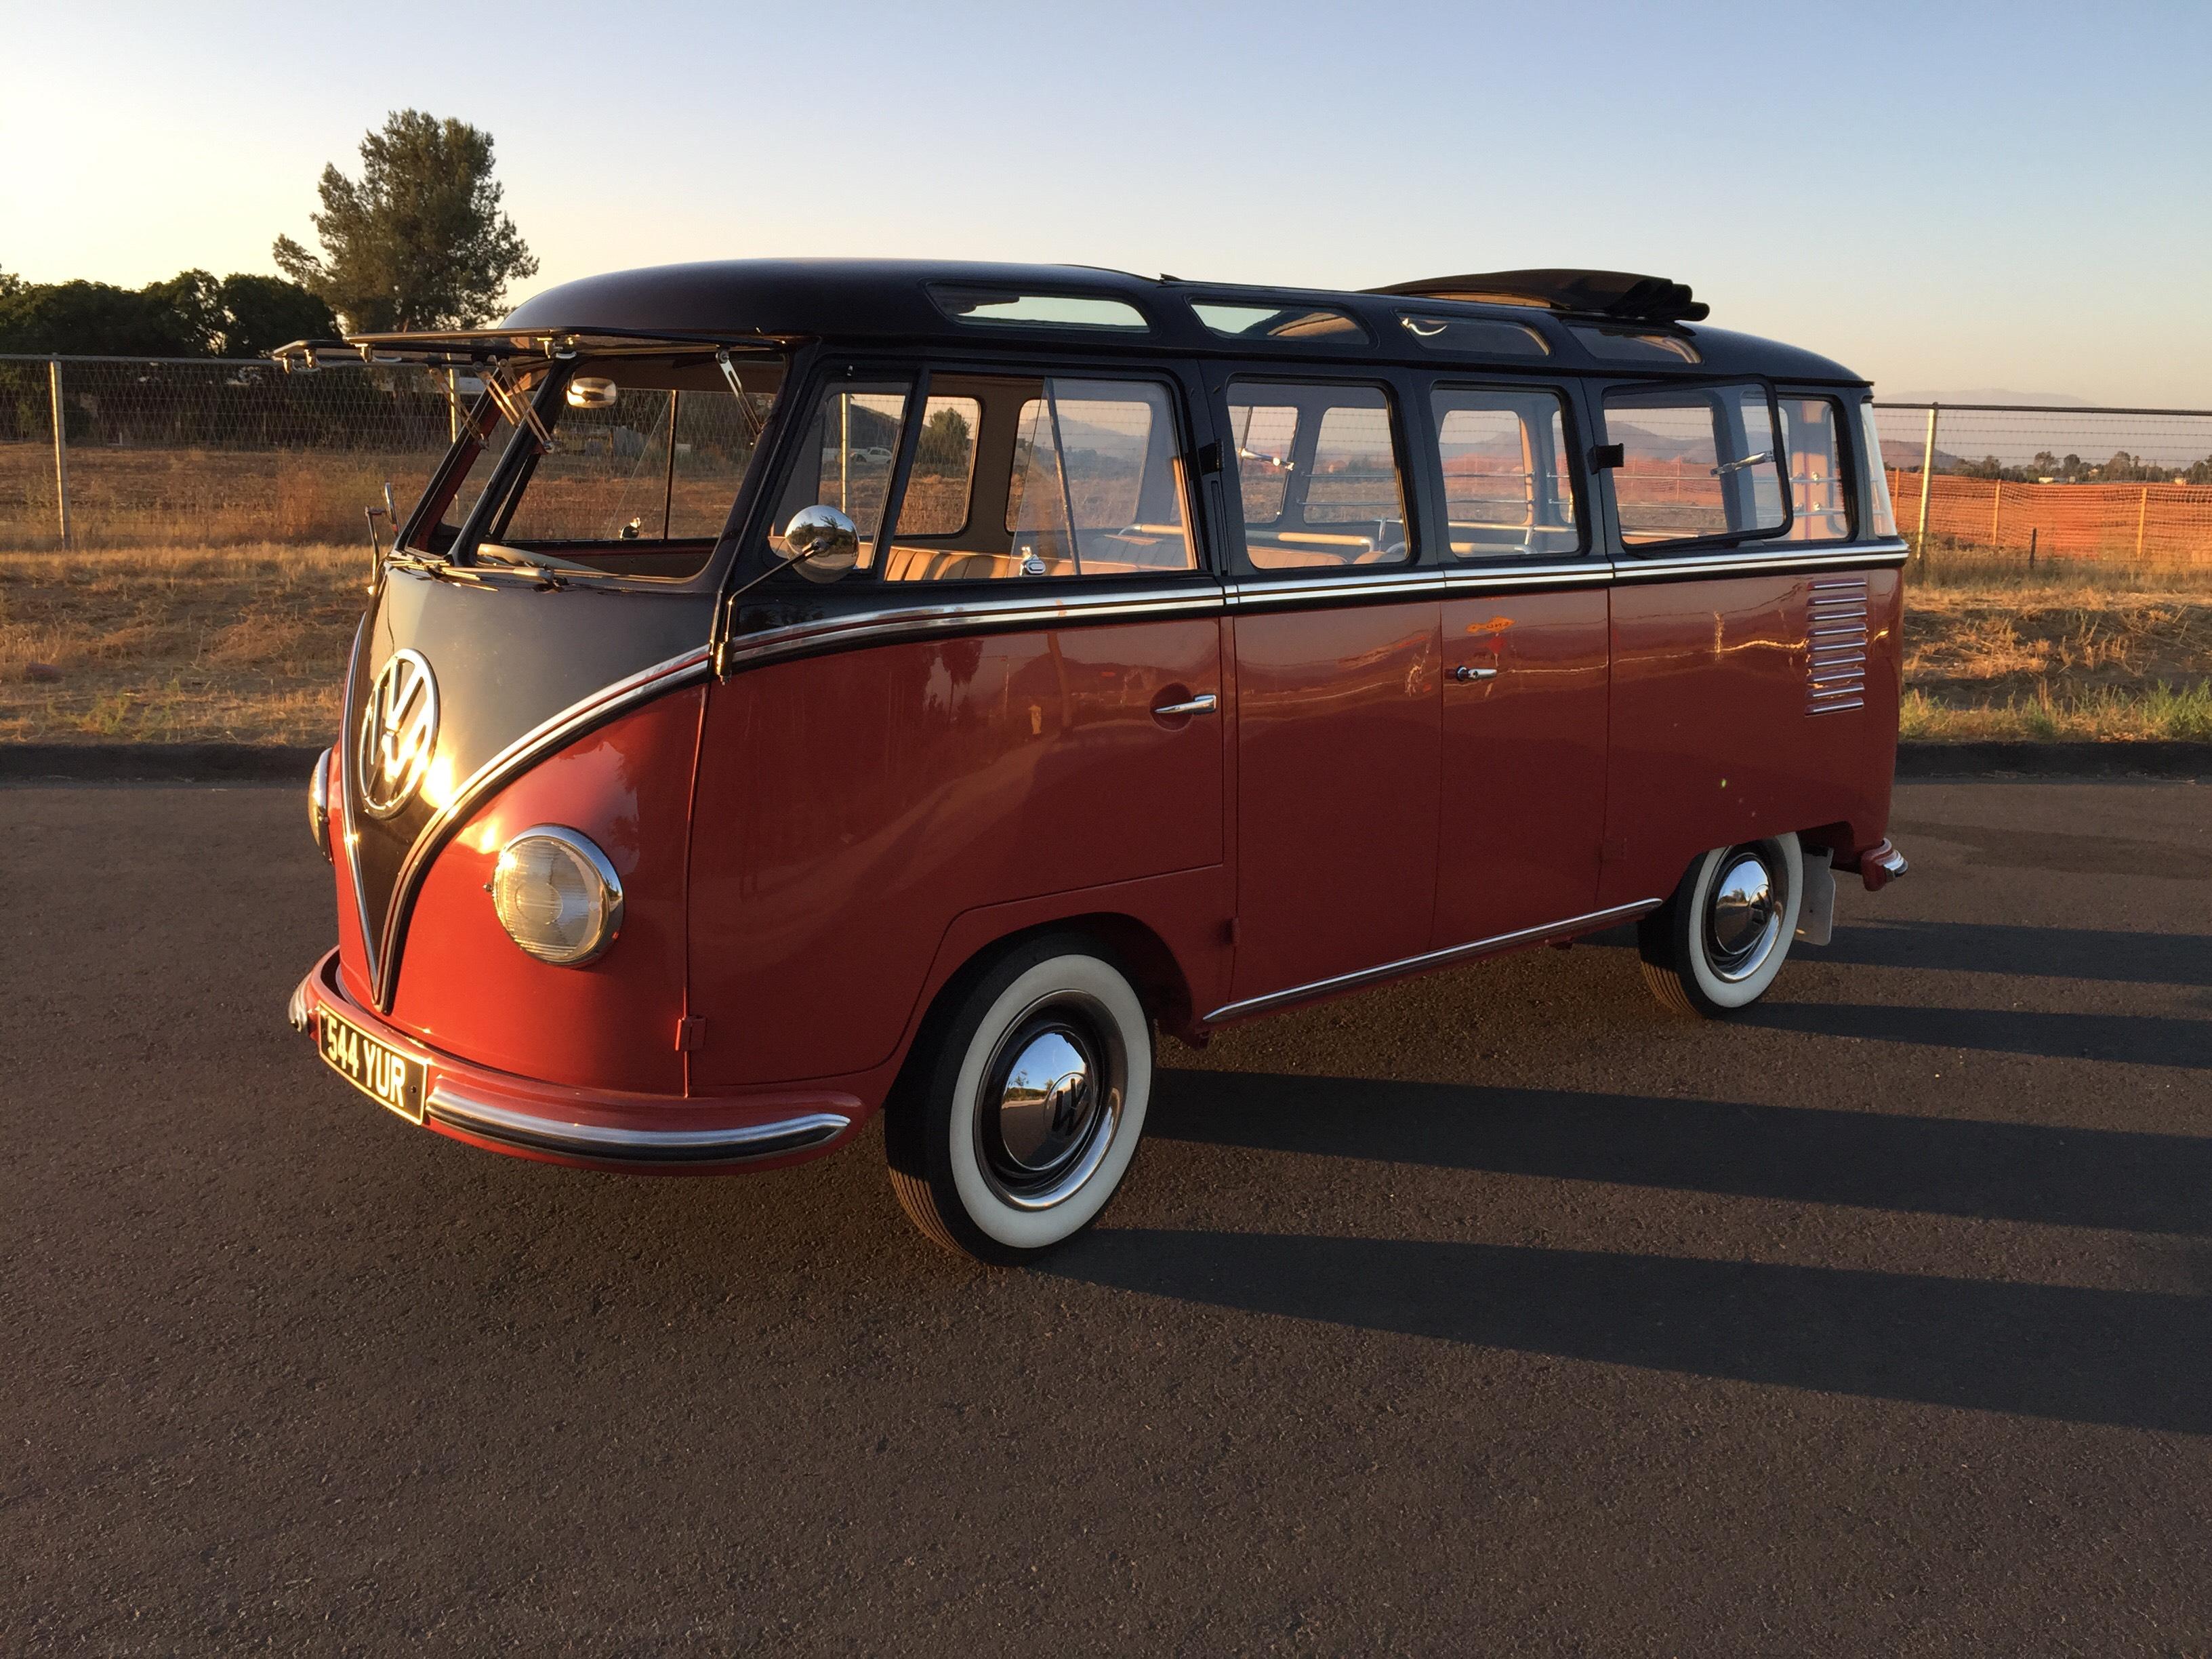 barrett-jackson vegas, Barrett-Jackson Countdown: 1956 Volkswagen 23-window Microbus, ClassicCars.com Journal